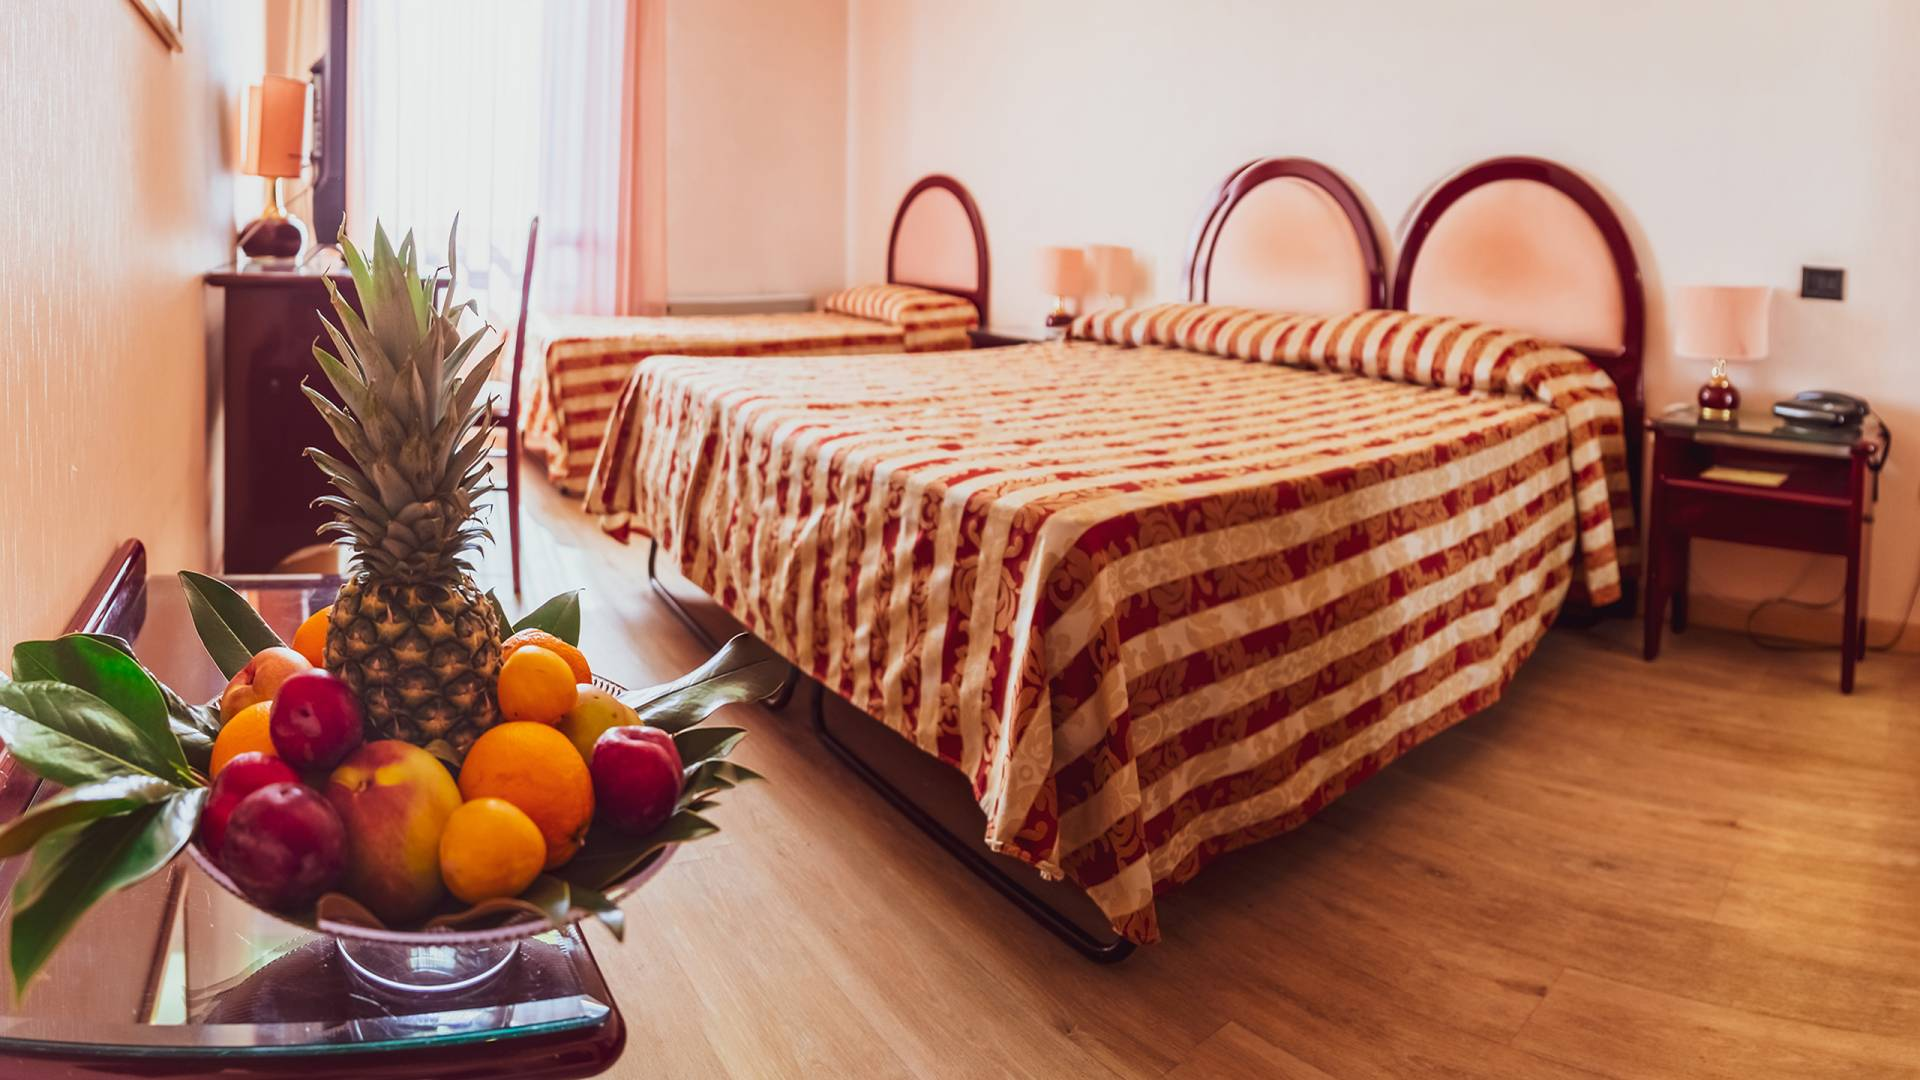 Balletti-palace-hotel-viterbo-single-room